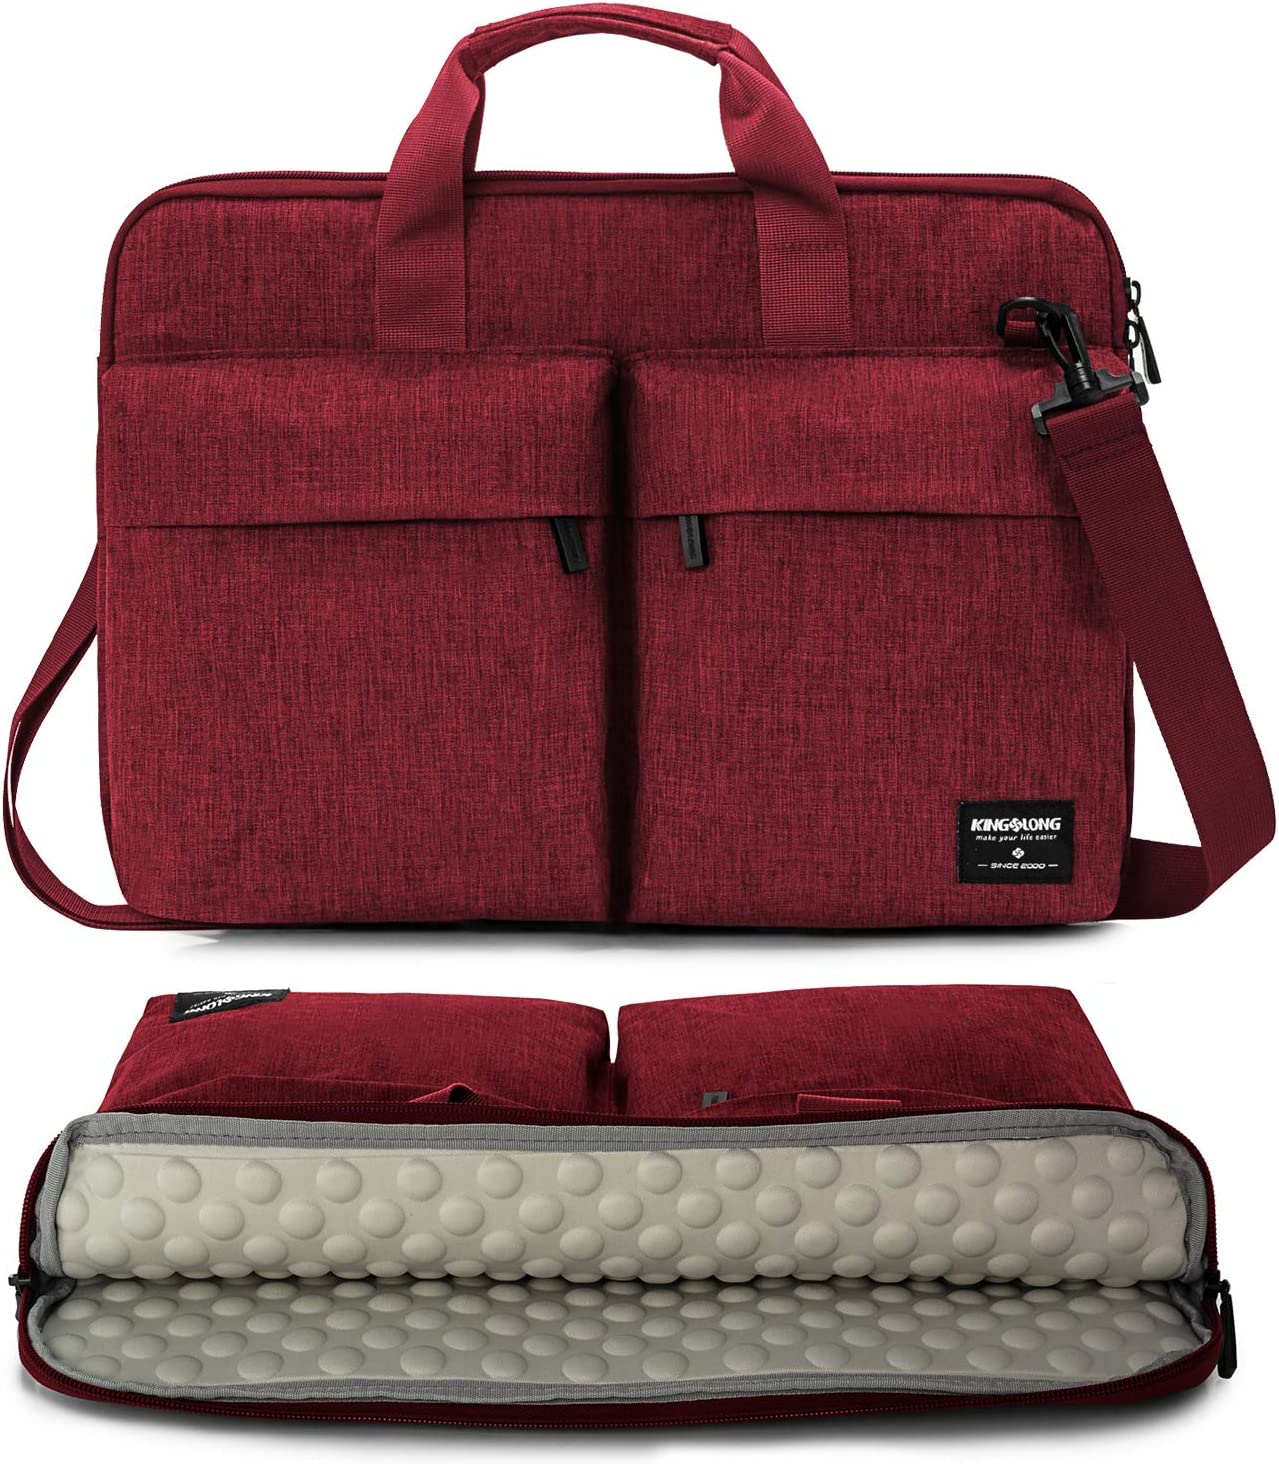 KINGSLONG 15 15.6 Inch Laptop Case Bag Sleeve, Lightweight Laptop Computer Notebook Ultrabooks Carrying Case Sleeve Handbag Cover for Men Women Fit for Acer Asus Dell Lenovo HP Toshiba, Red